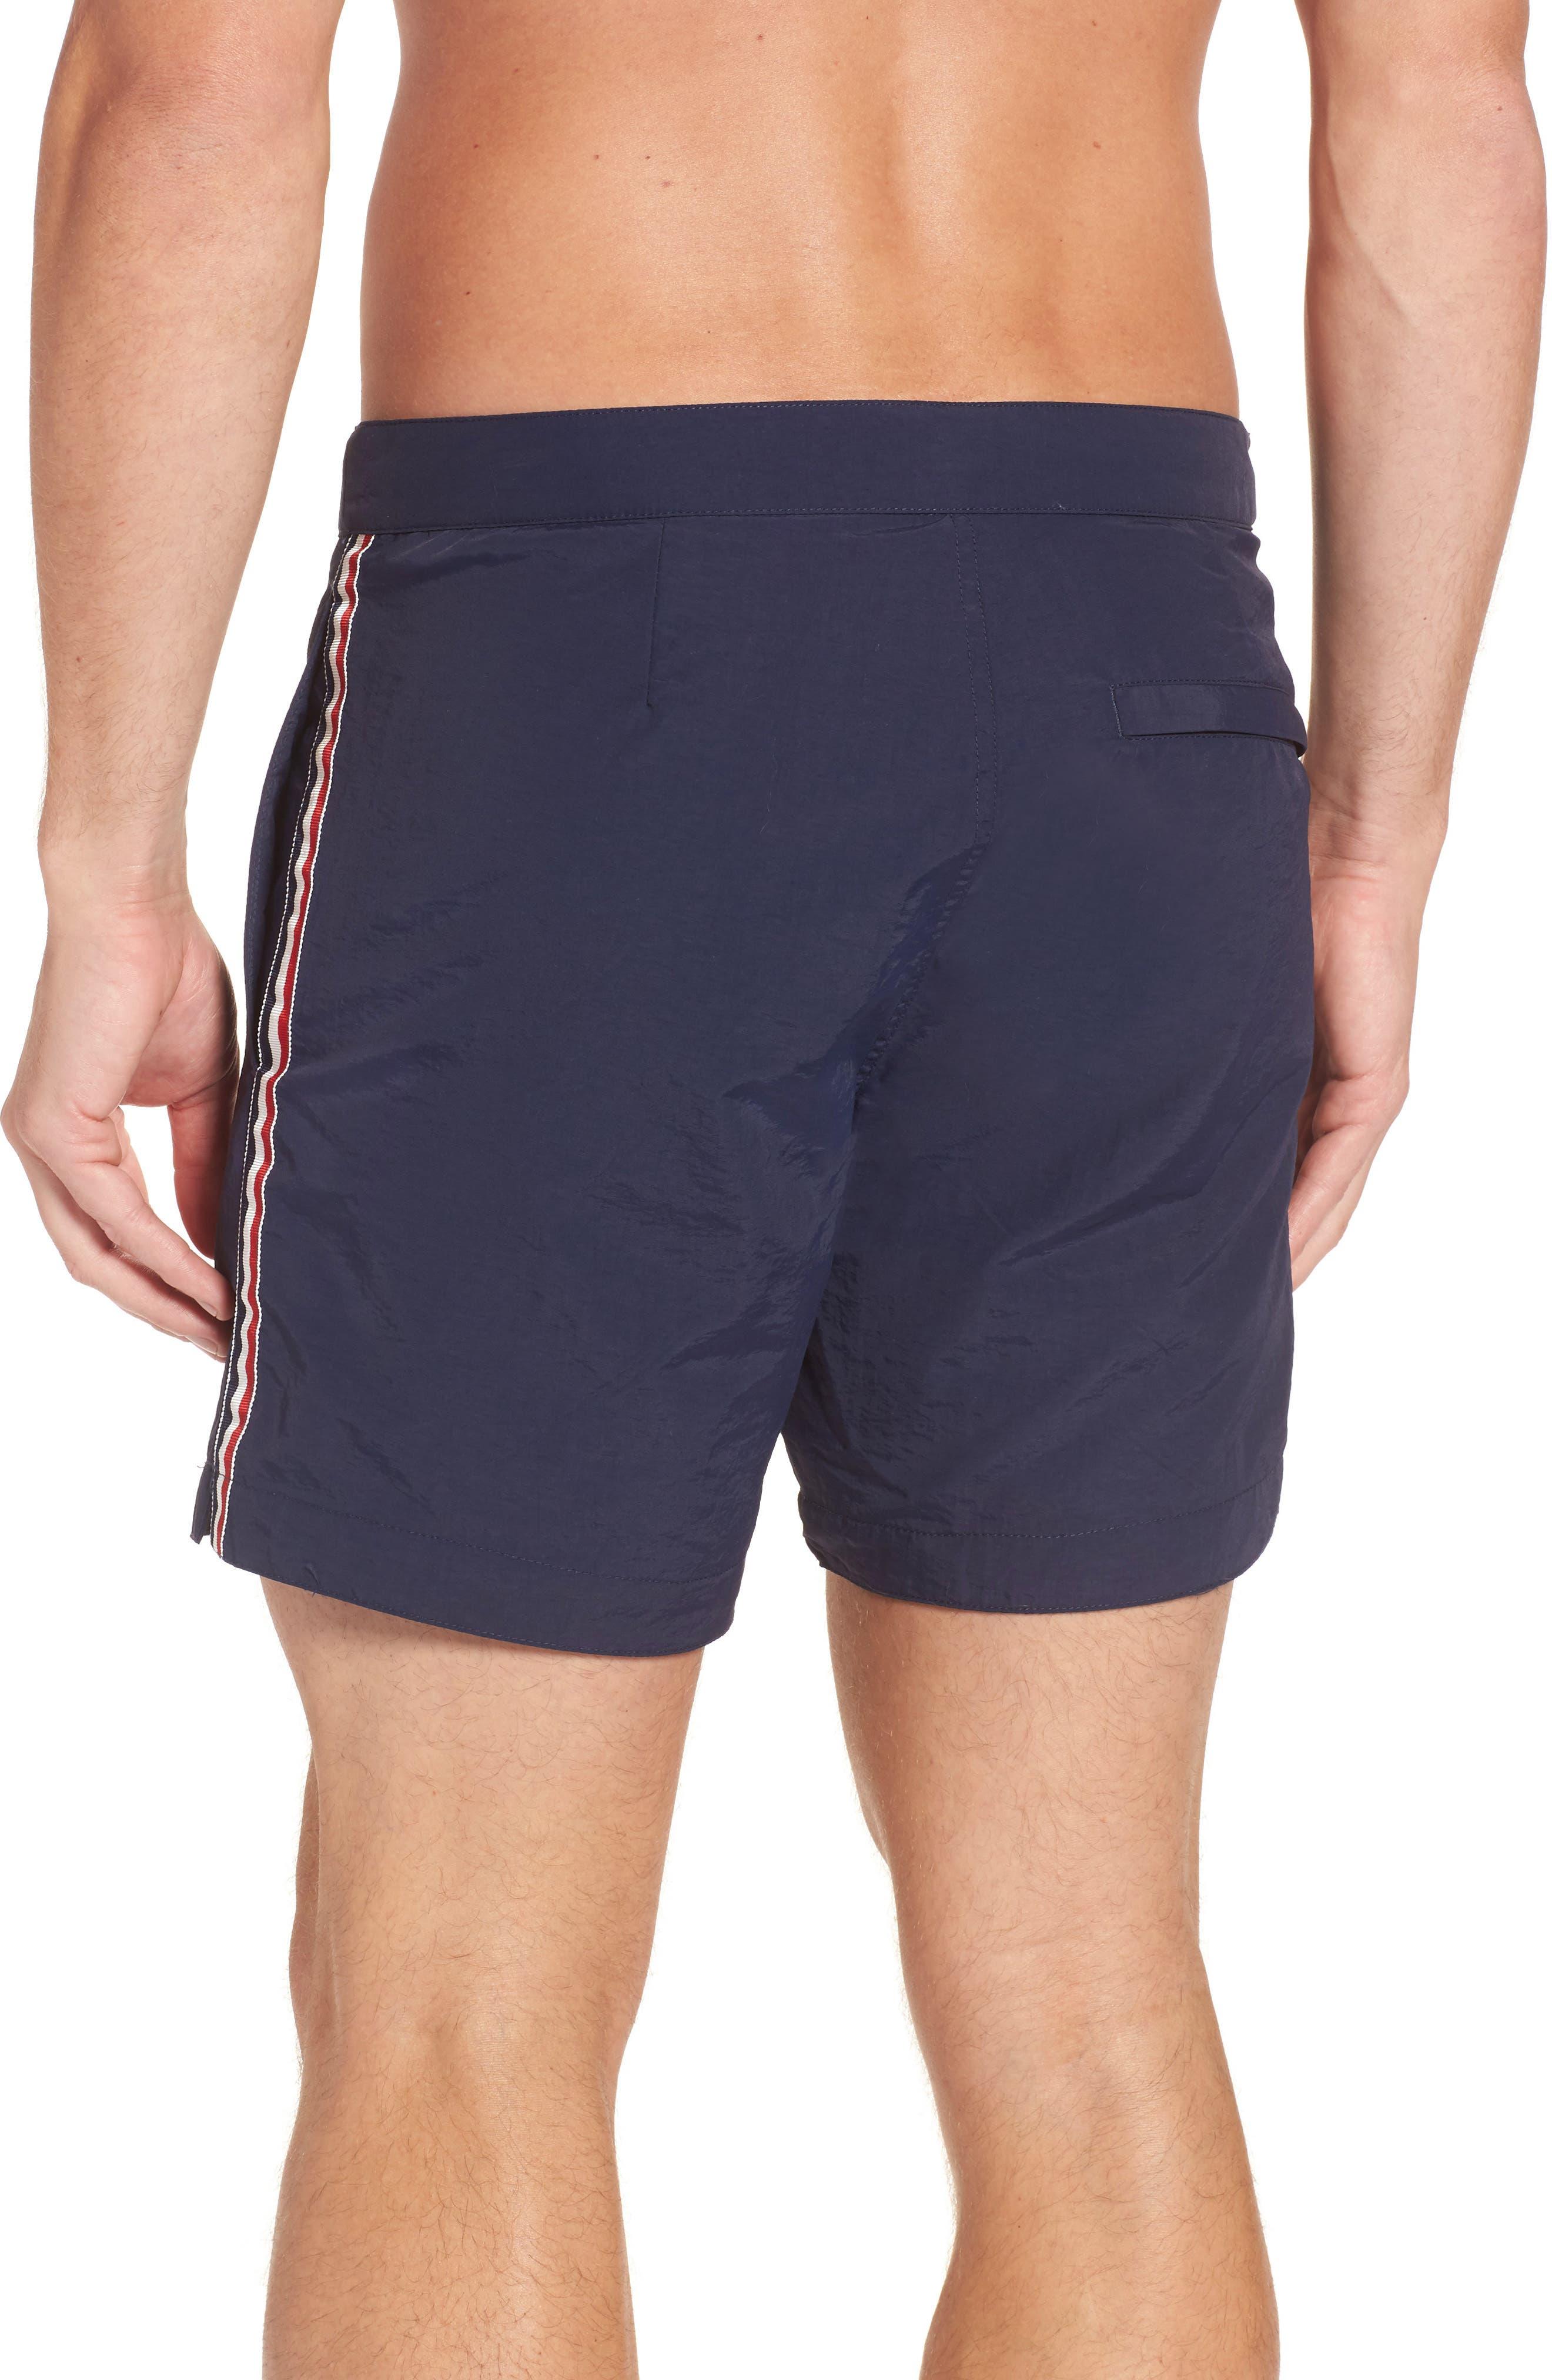 Aruba Tailored Fit French Stripe Swim Trunks,                             Alternate thumbnail 4, color,